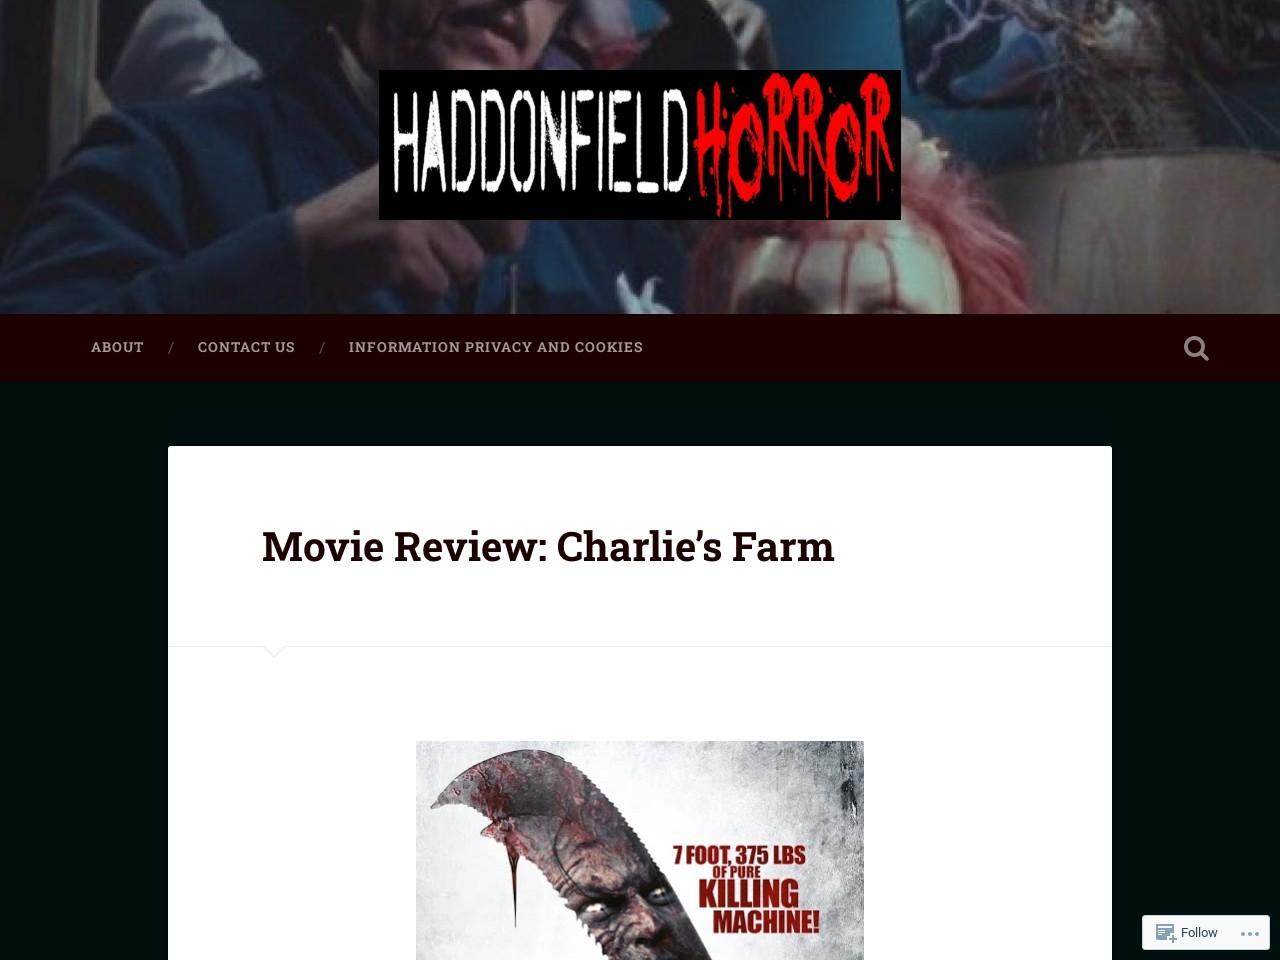 Haddonfield Horror: Movie Review: Charlie's Farm